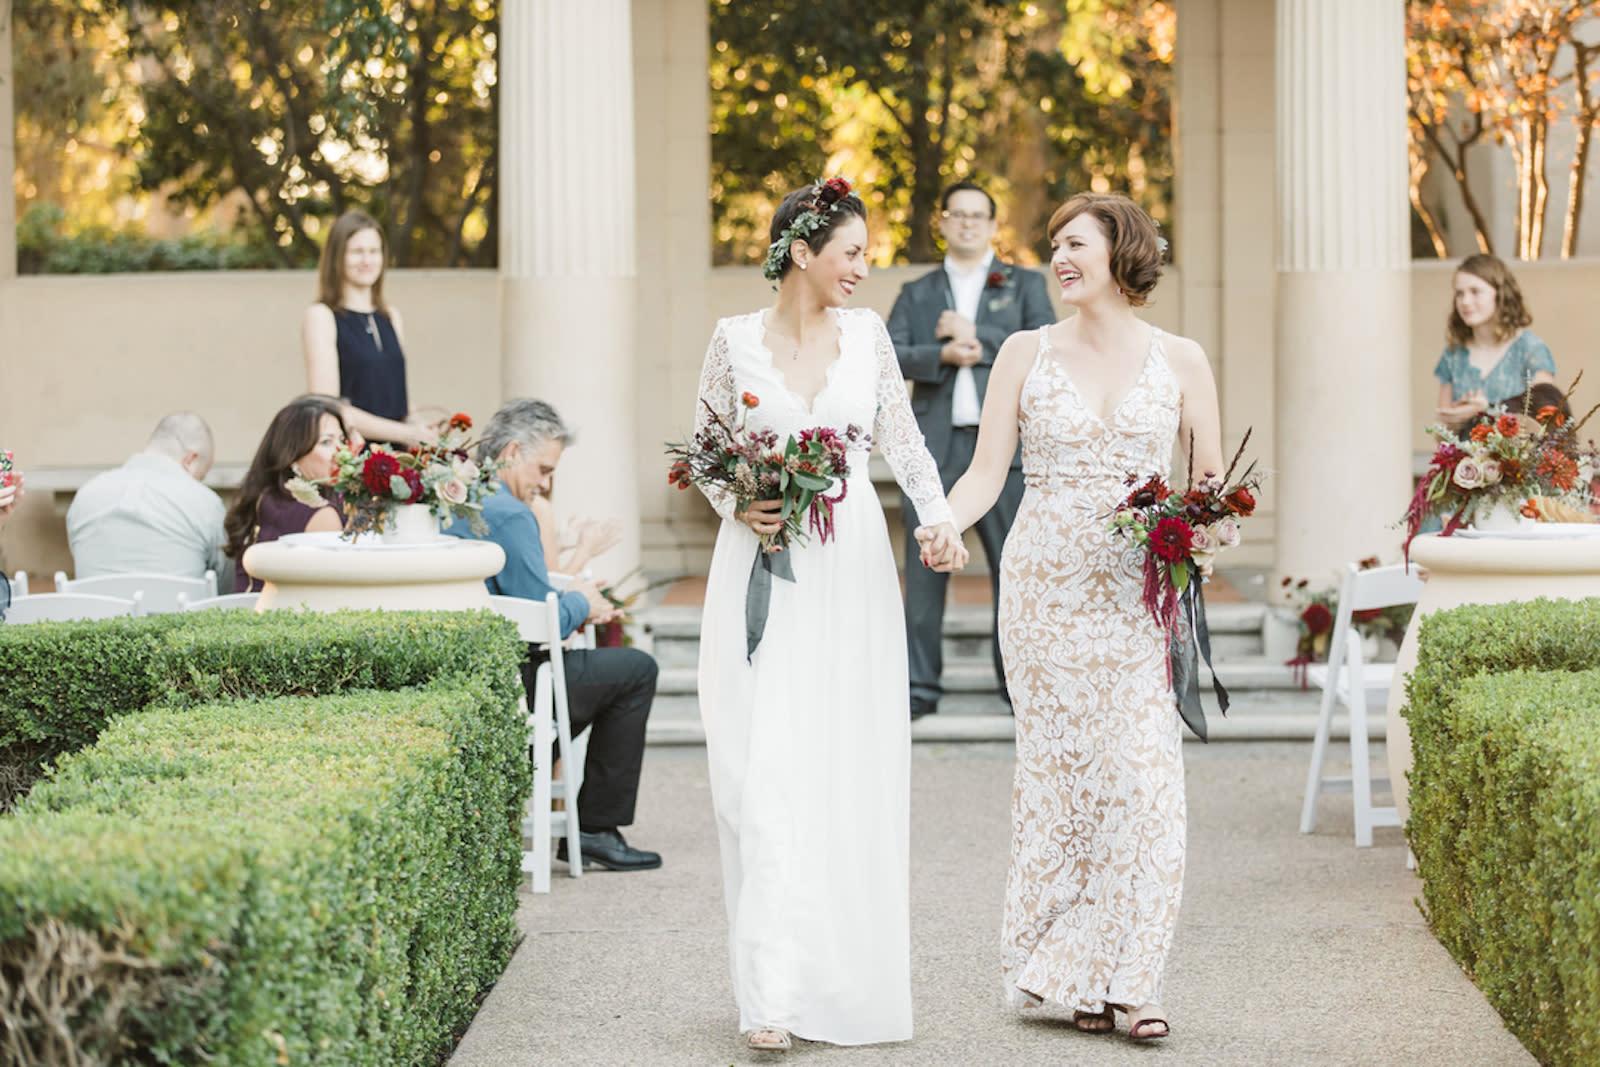 How To Plan A Wedding On A Budget Zola Expert Wedding Advice